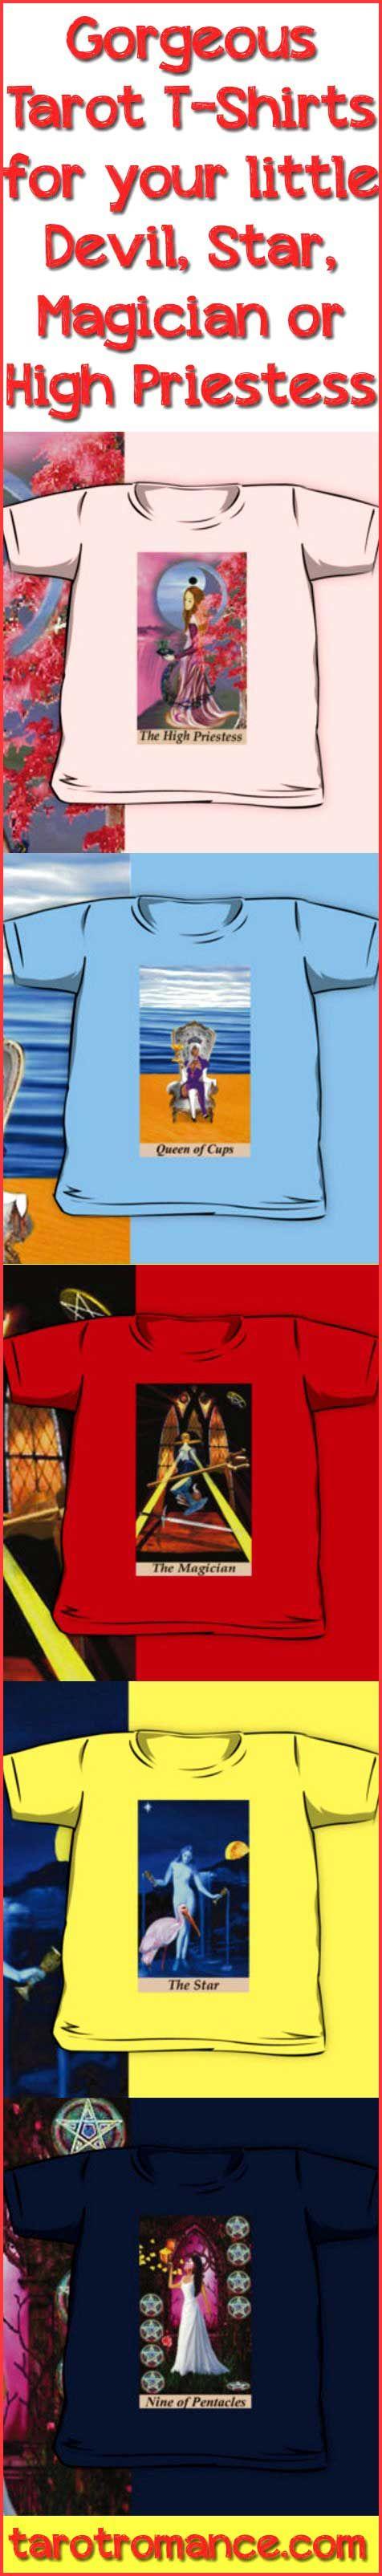 Children's Tarot T-Shirts for your little Devil, Star or High Priestess! #tarotcards